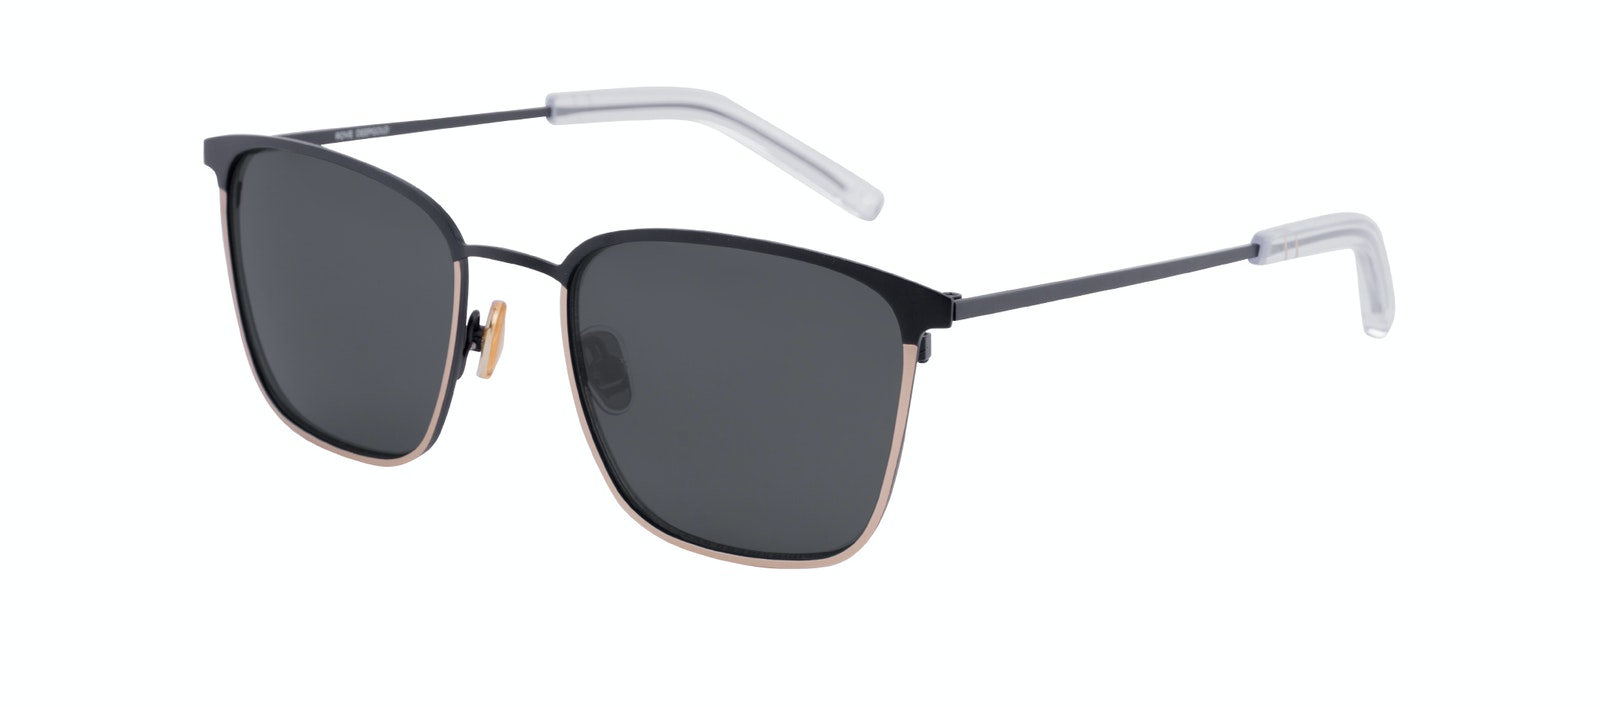 Affordable Fashion Glasses Rectangle Sunglasses Men Rove Deep Gold Tilt